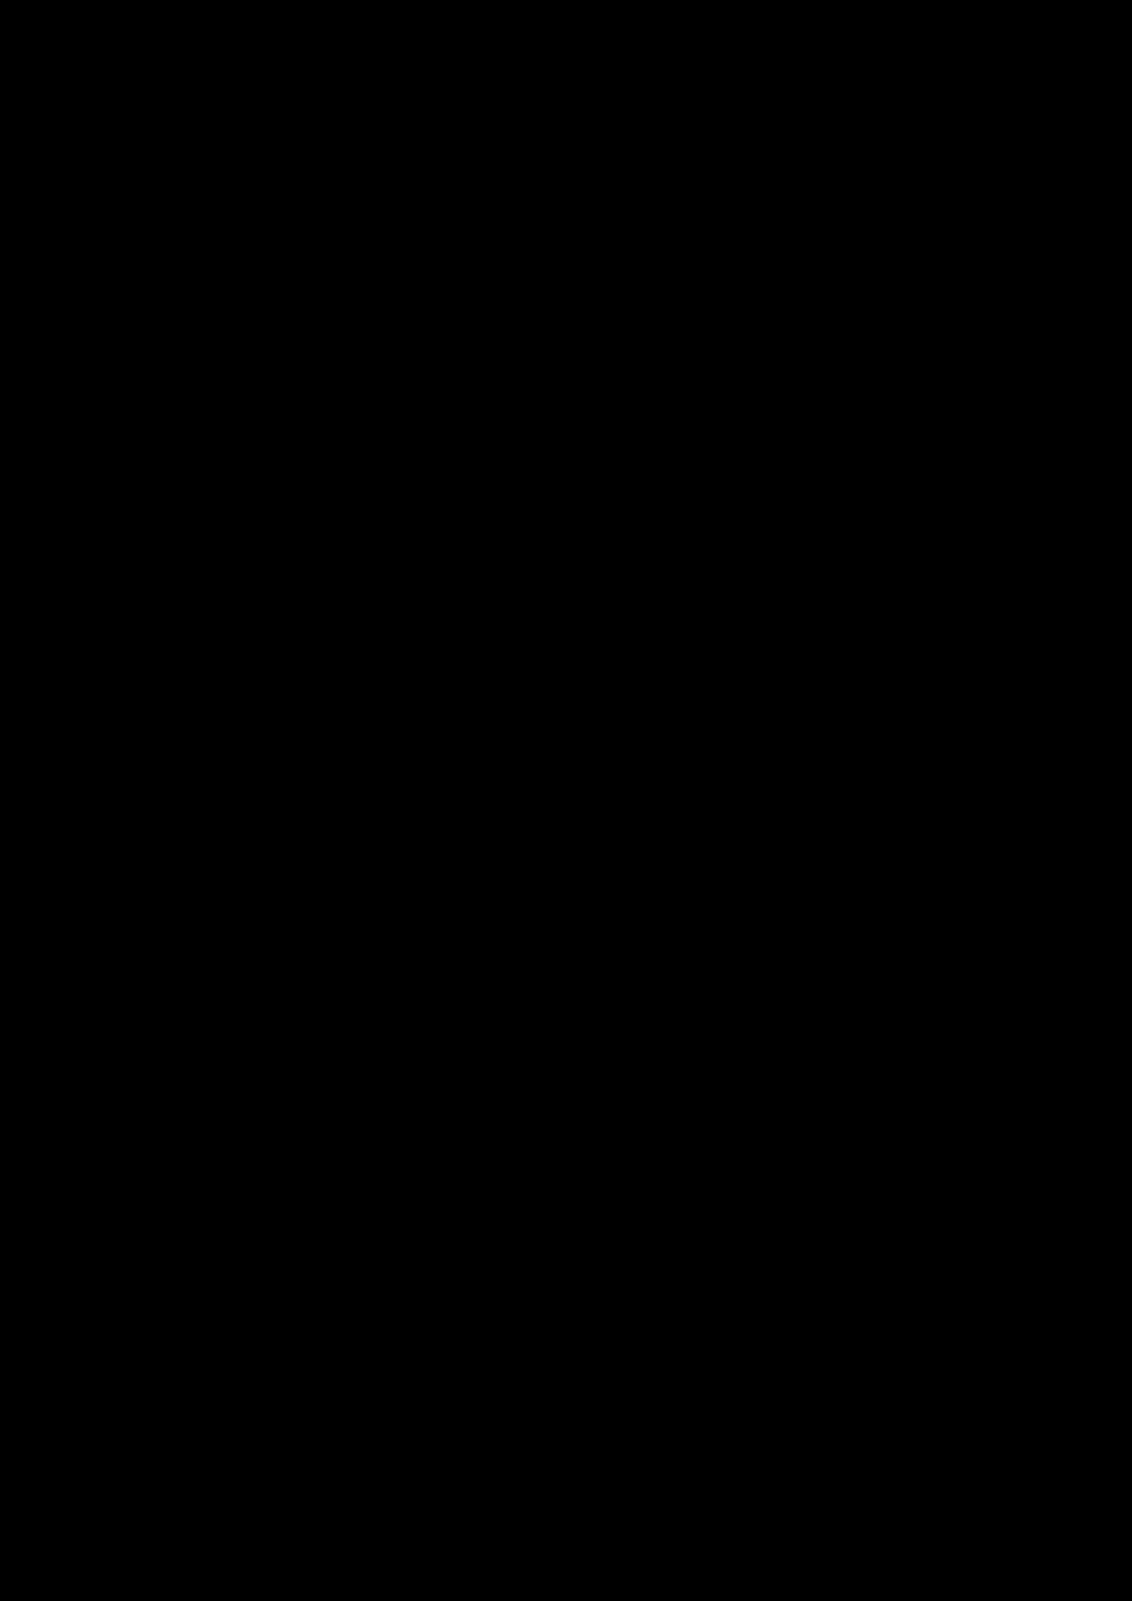 Korolevstvo slez slide, Image 76